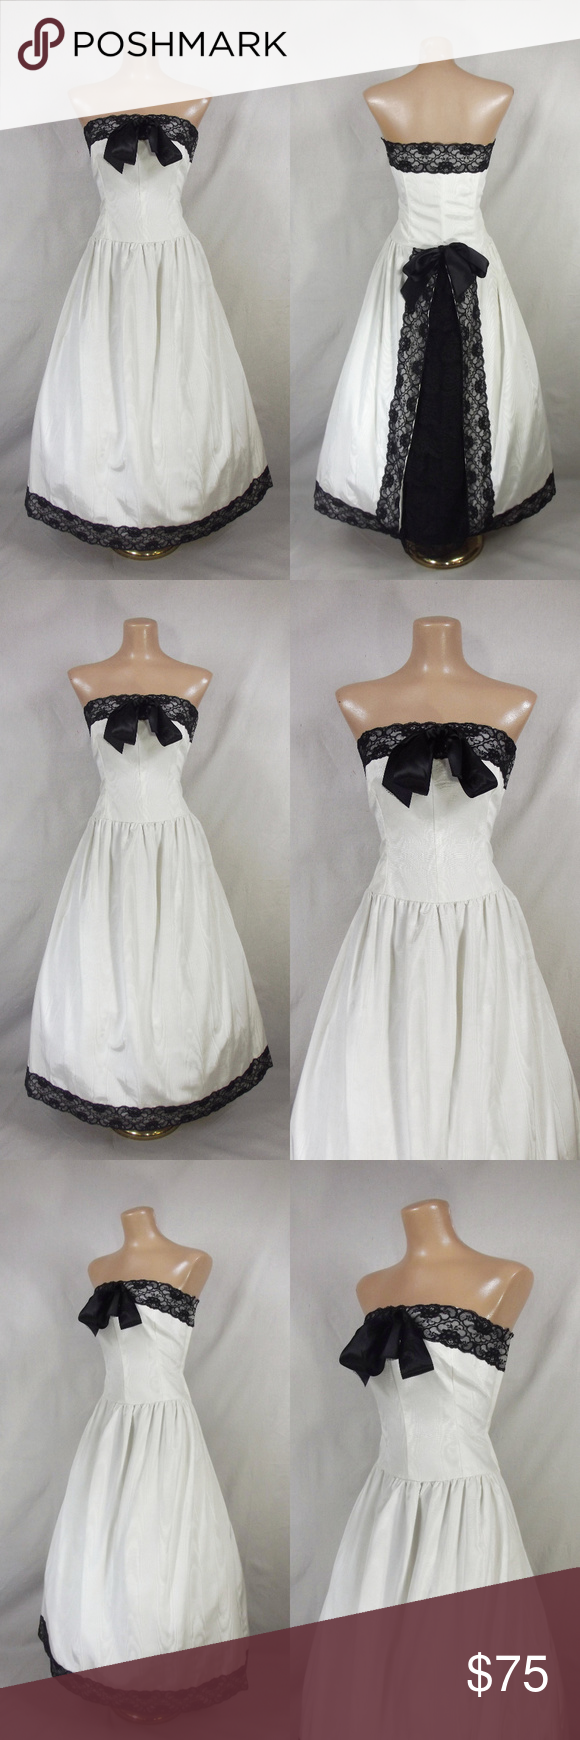 Vintage s moire taffeta strapless prom dress my posh closet